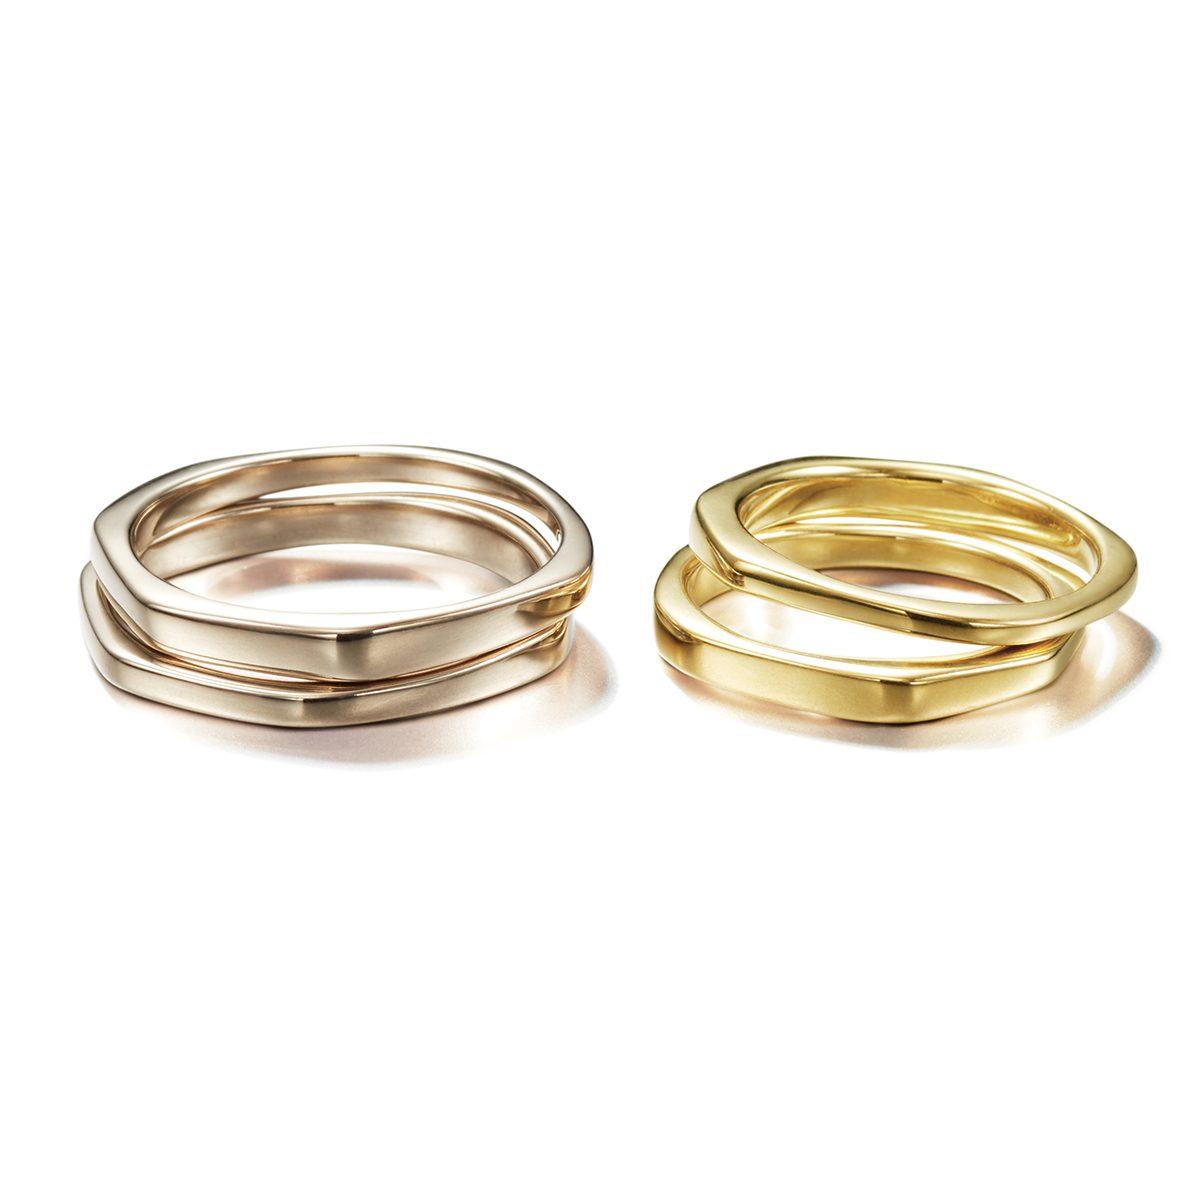 CORINNE HAMAK - Half & Other Half Marriage Rings